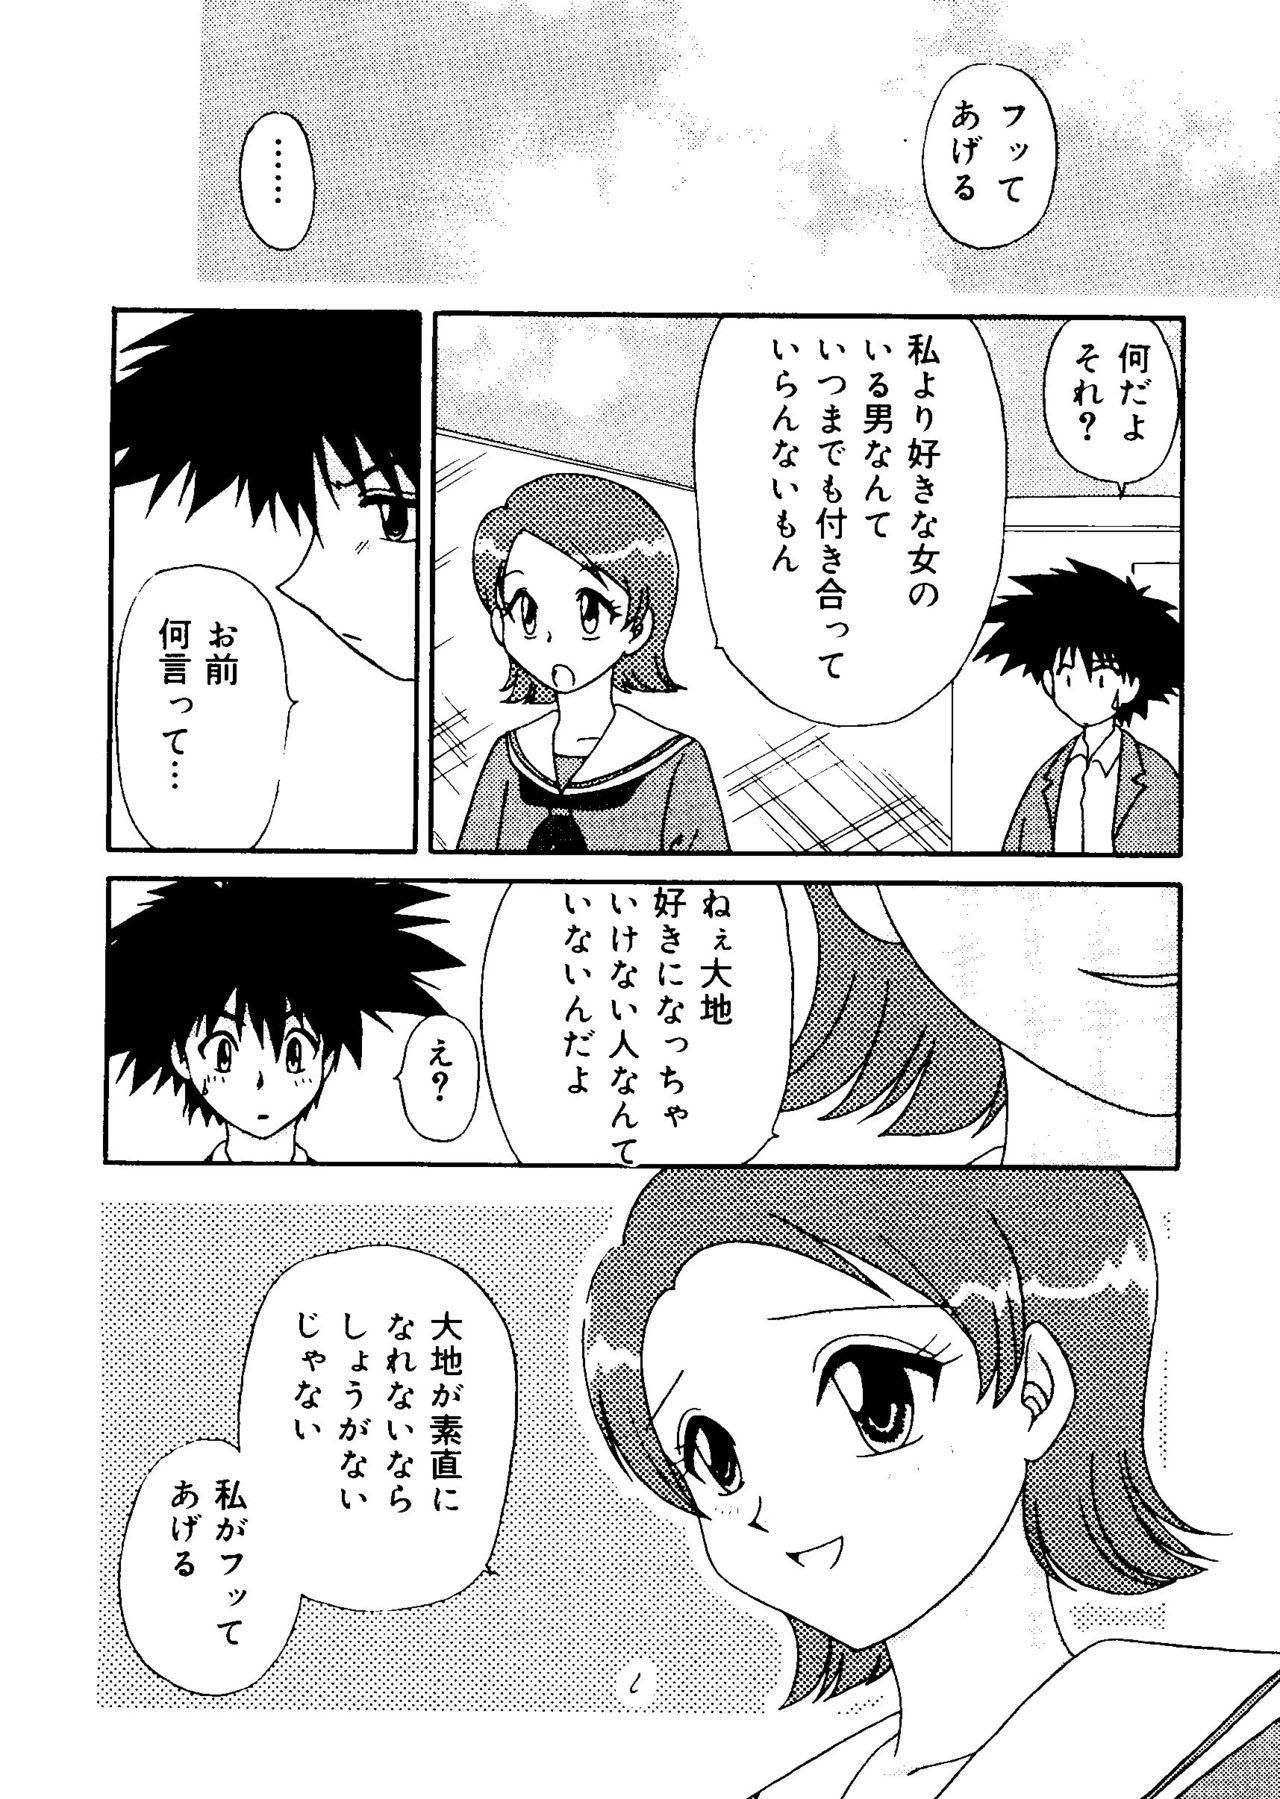 Love Chara Taizen No. 12 120